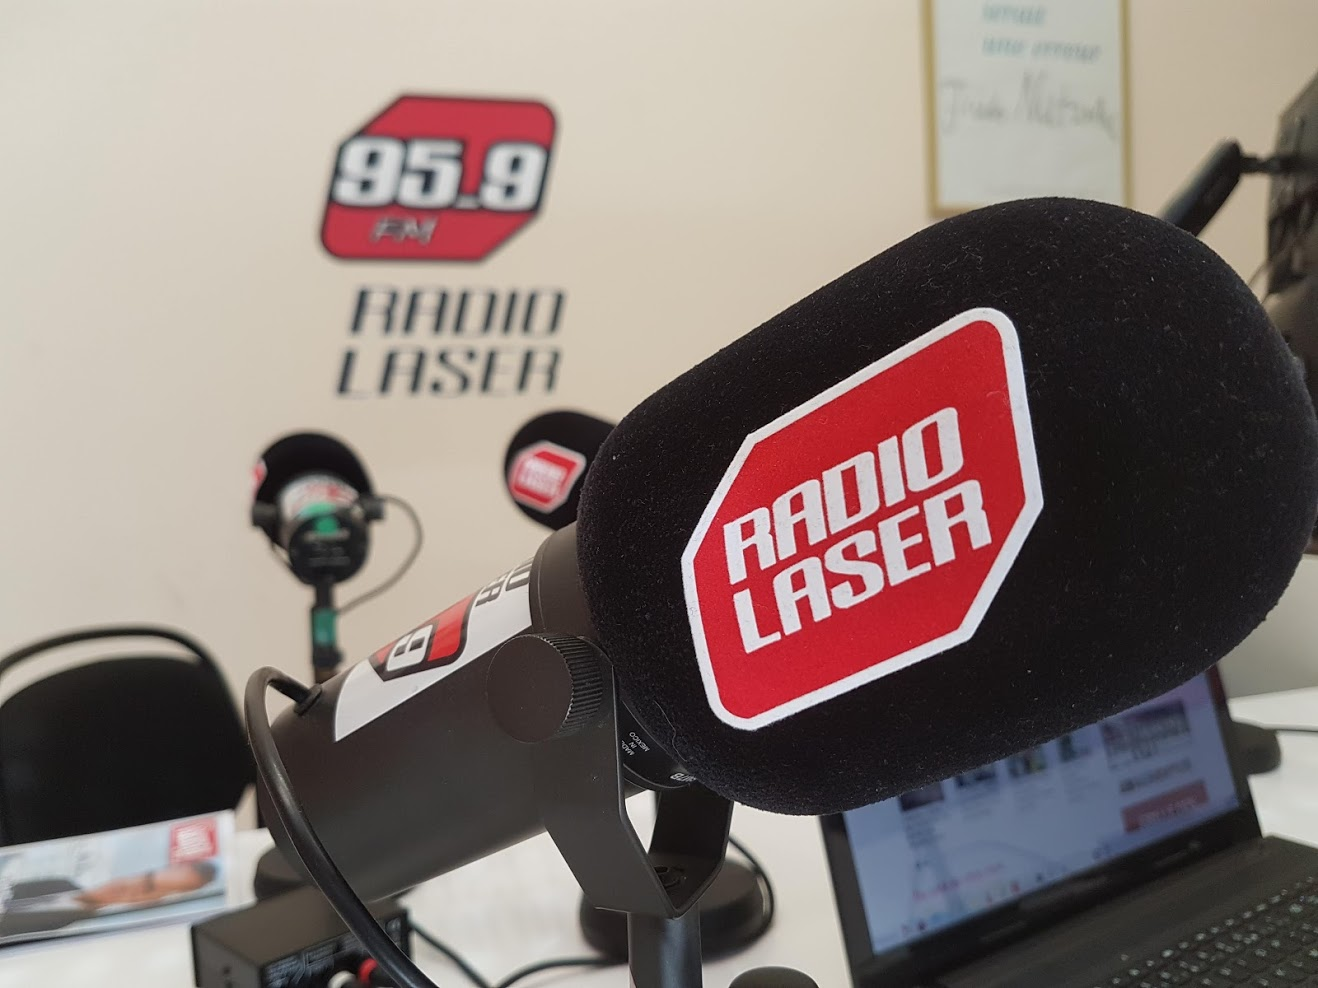 Image de présentation - Radio Laser (Rennes)